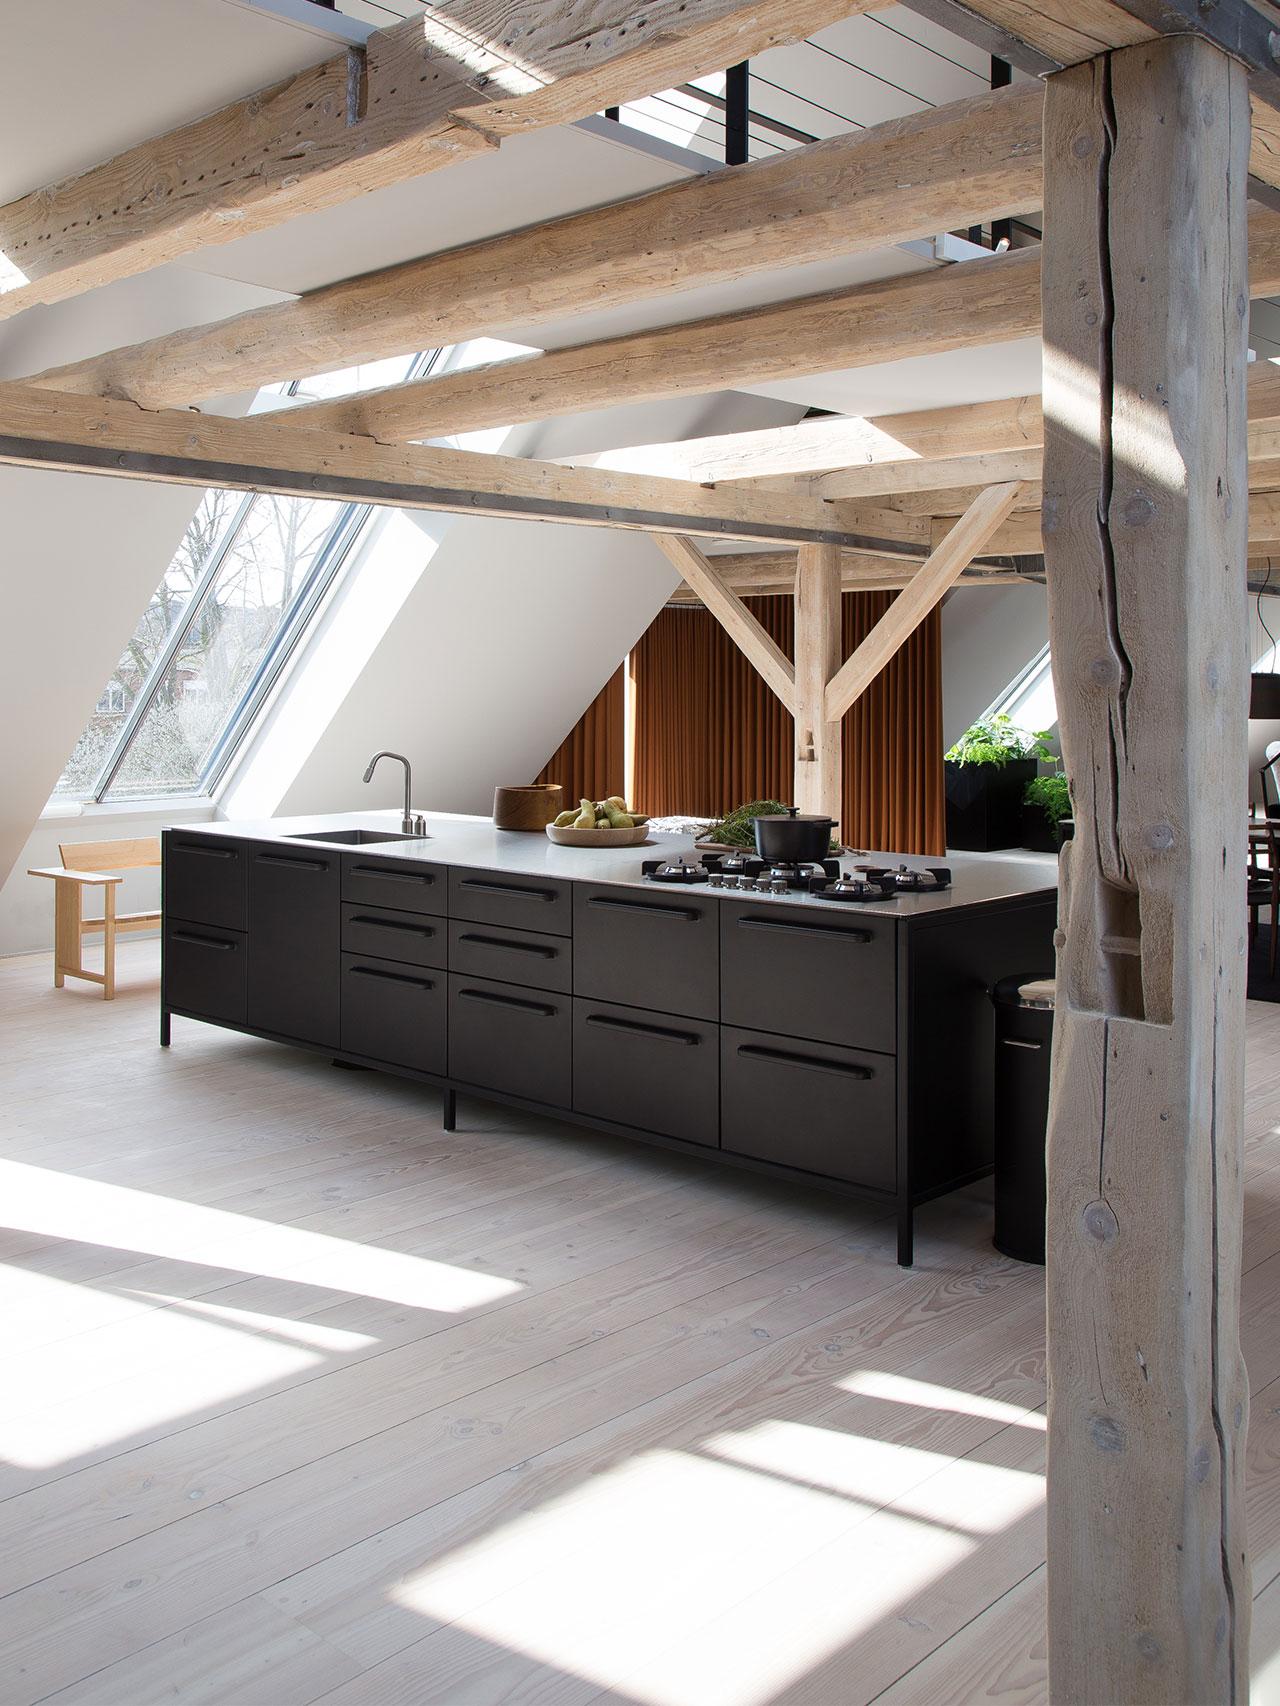 xvipp-kitchen-loft-4_0.jpg.pagespeed.ic.vY_NU4r13M.jpg